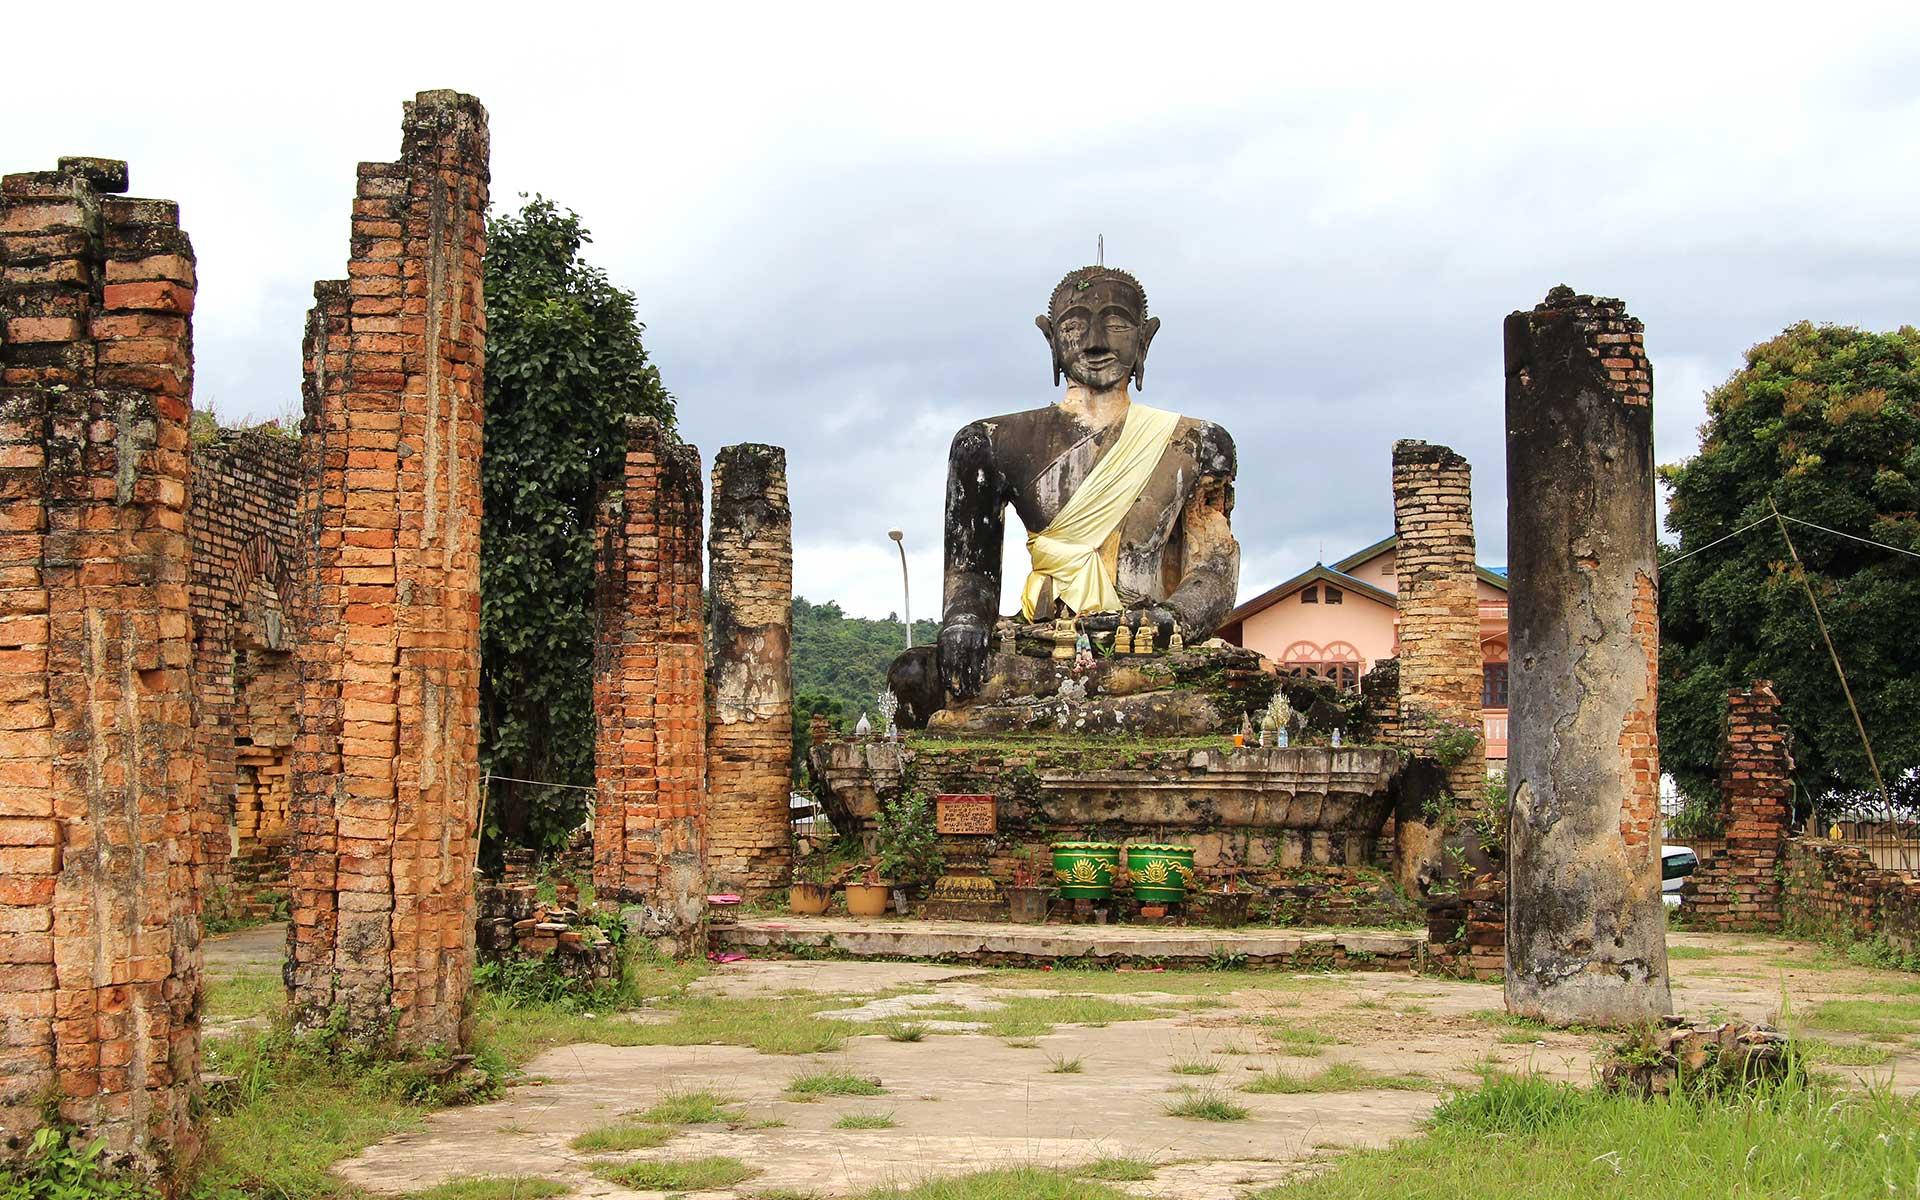 Buddha statue in the ruins of Wat Phia Wat temple in Muang Khoun.